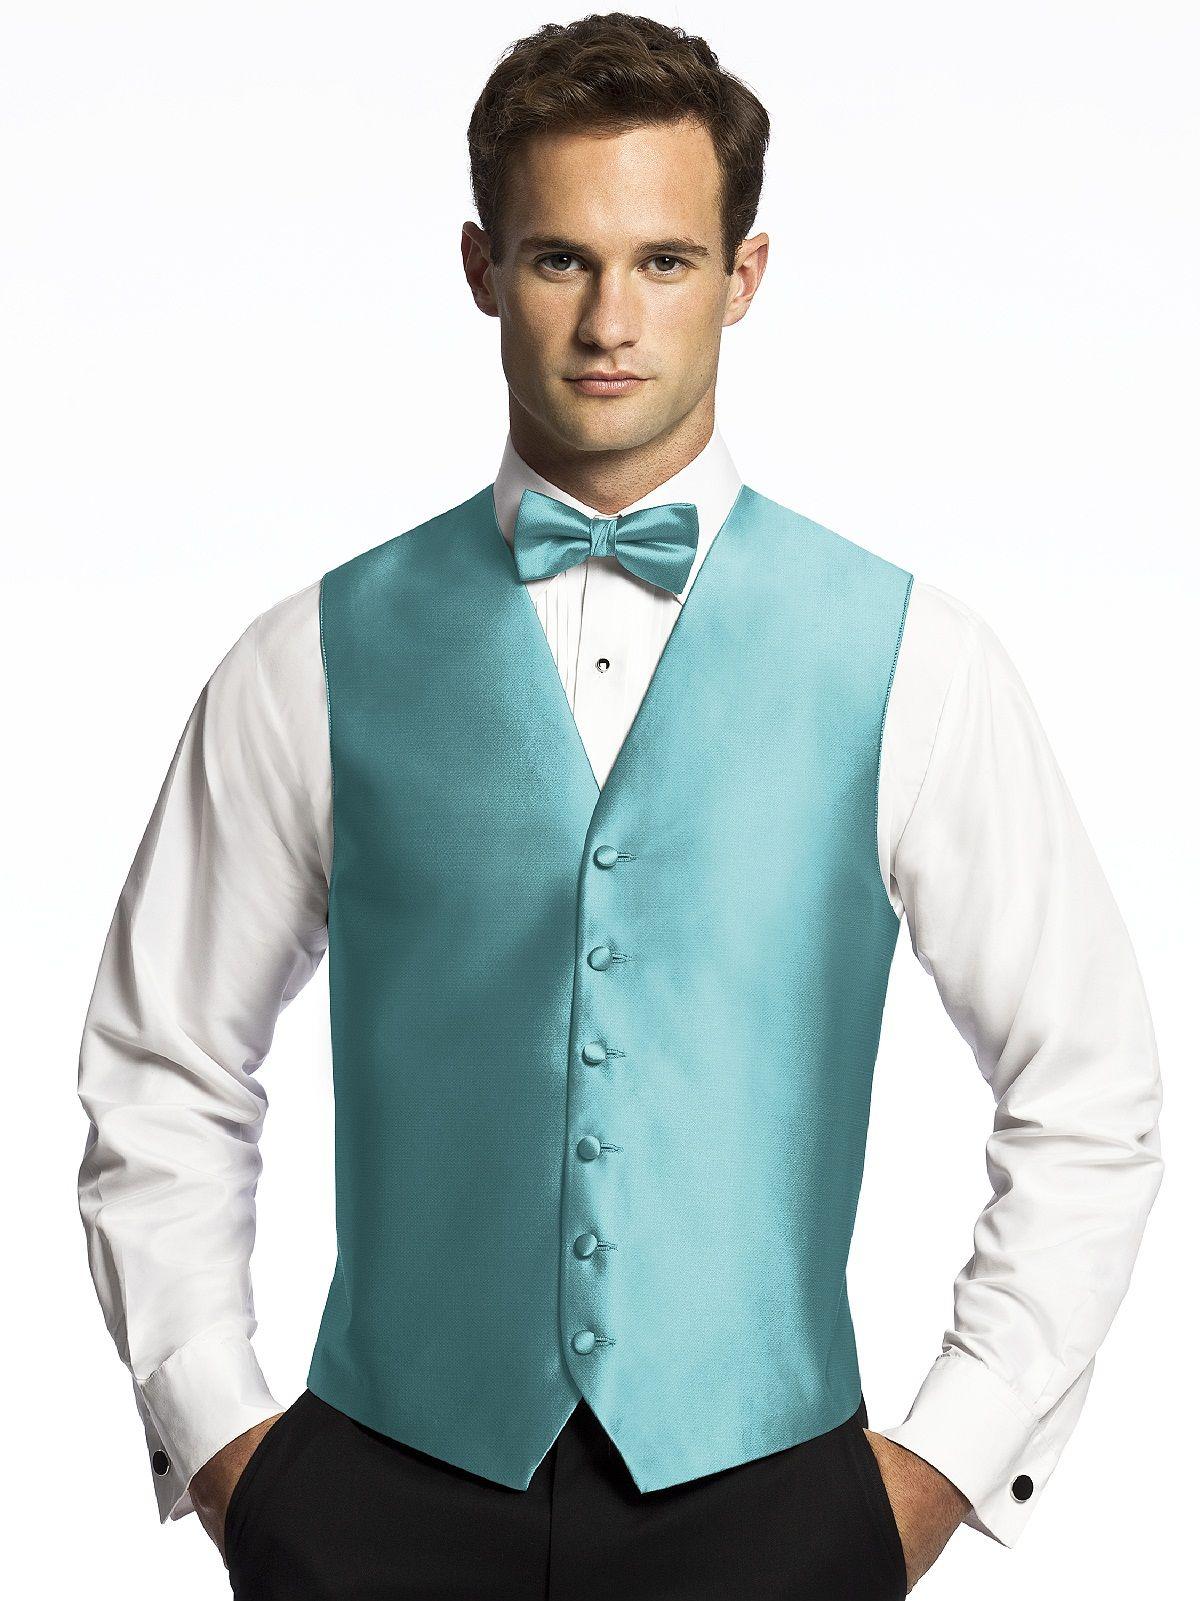 For the men | Wedding - Blue - Turquoise | Pinterest | Wedding blue ...